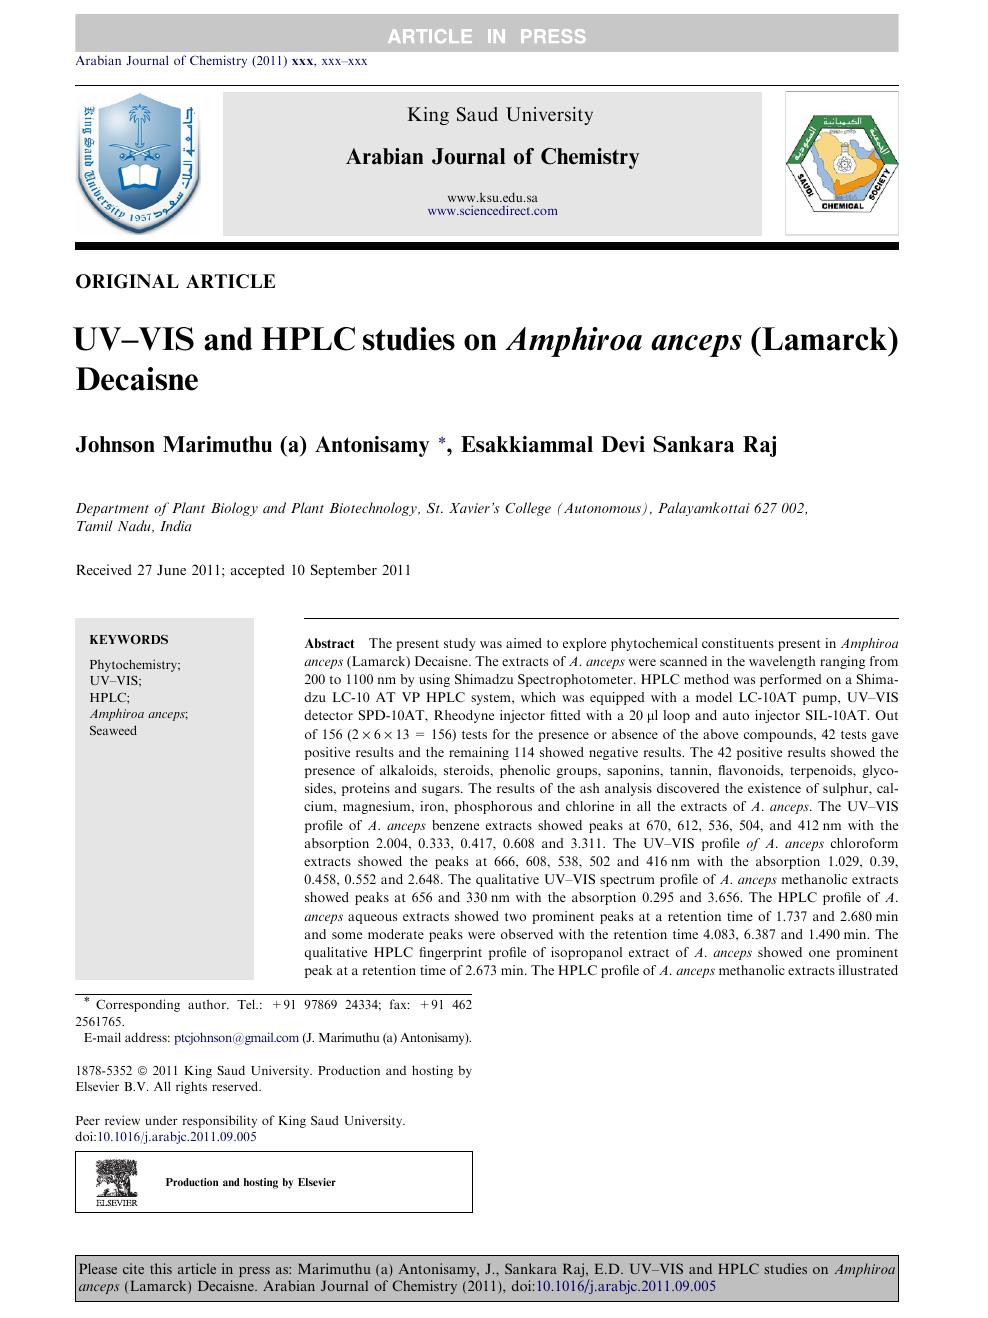 UV–VIS and HPLC studies on Amphiroa anceps (Lamarck) Decaisne